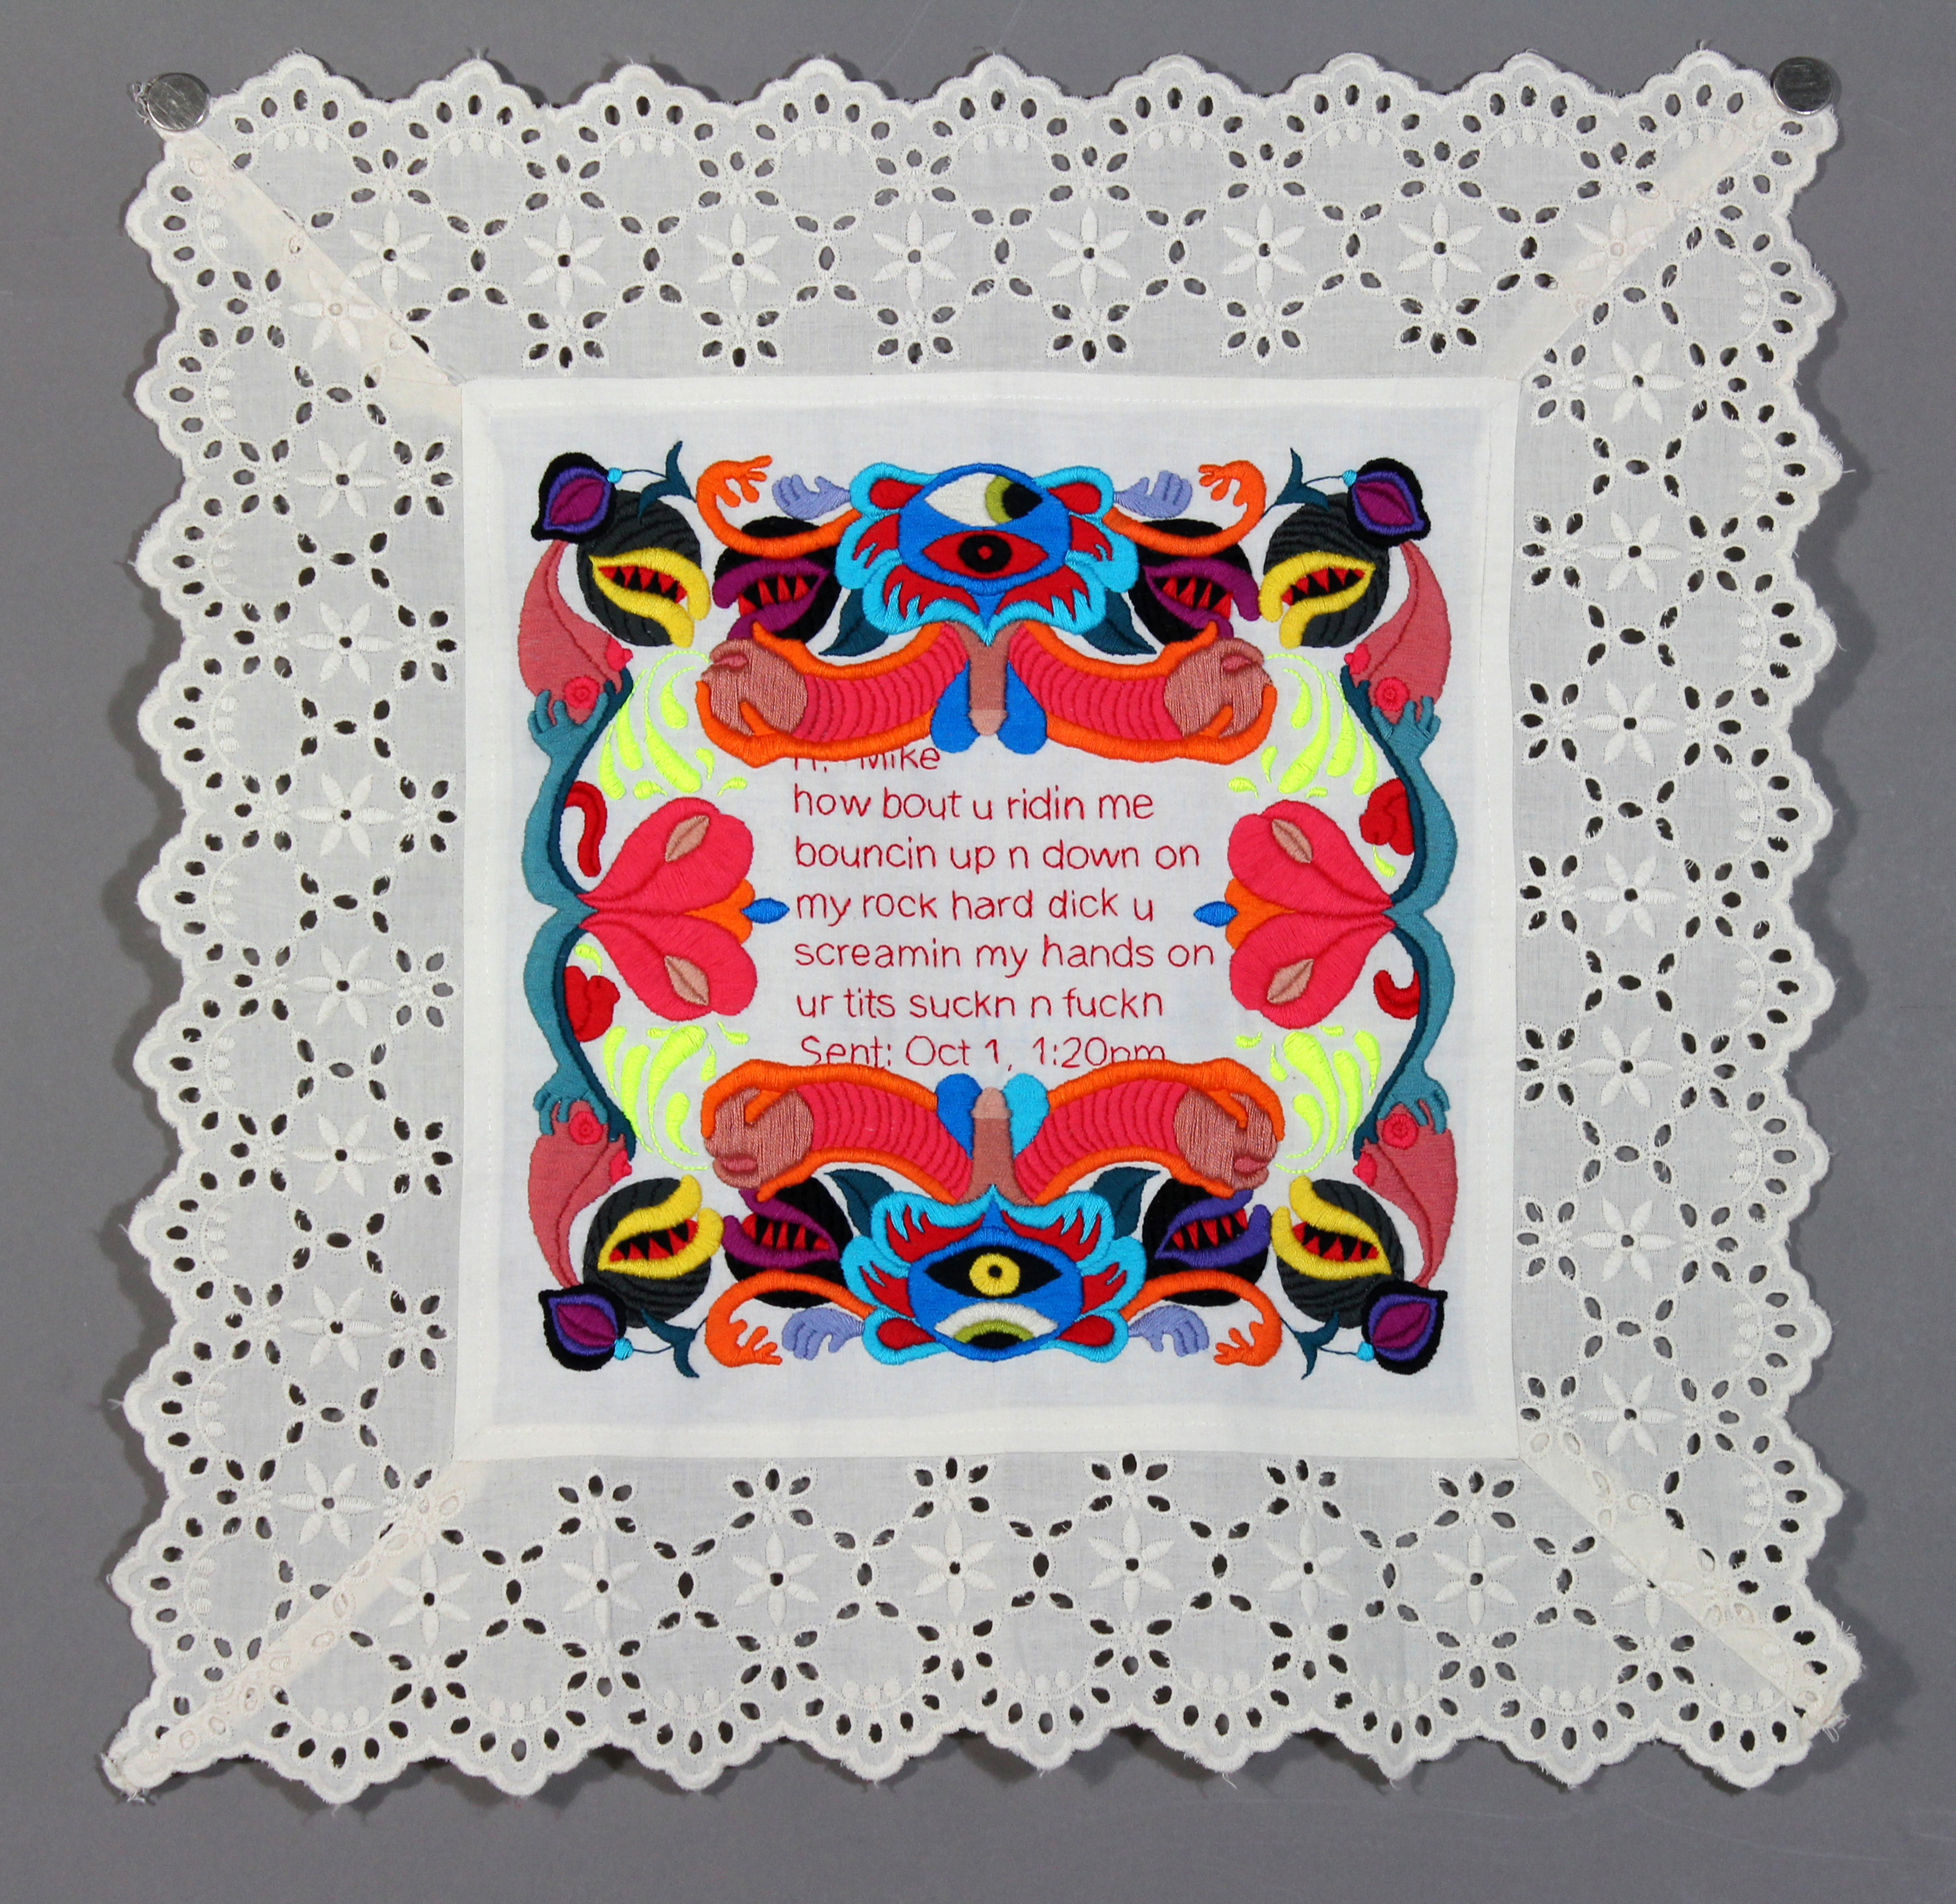 Kathyrn Shinko - Dirty Sampler Series - how bout u ridin me - hand embroidery on cloth (2014)